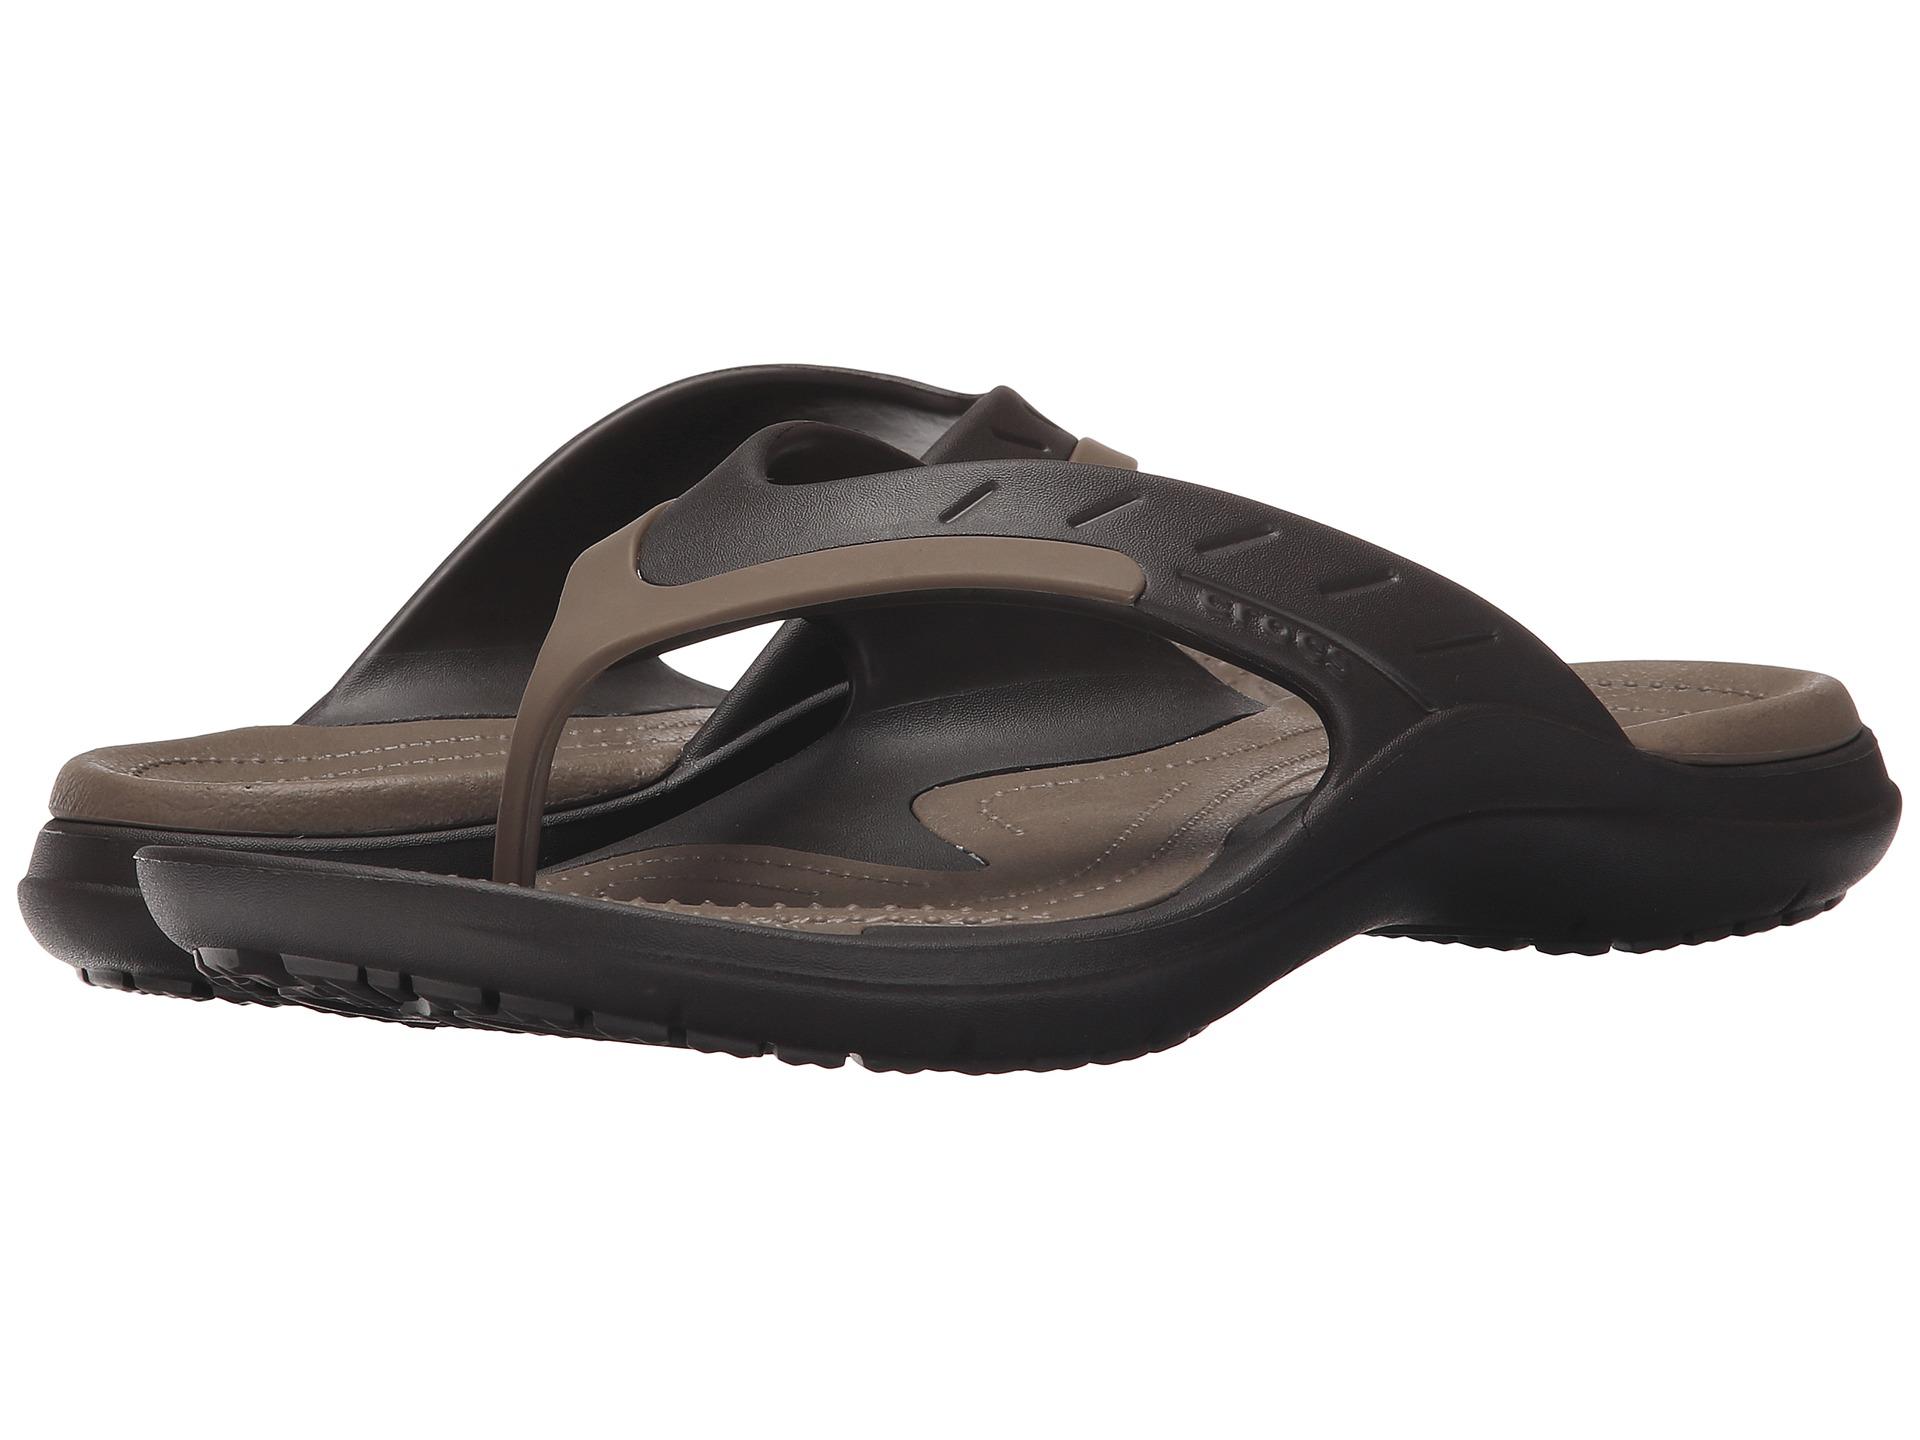 Flip Flops Crocs | Crocs Modi Flip Flop | Croc Flip Flop